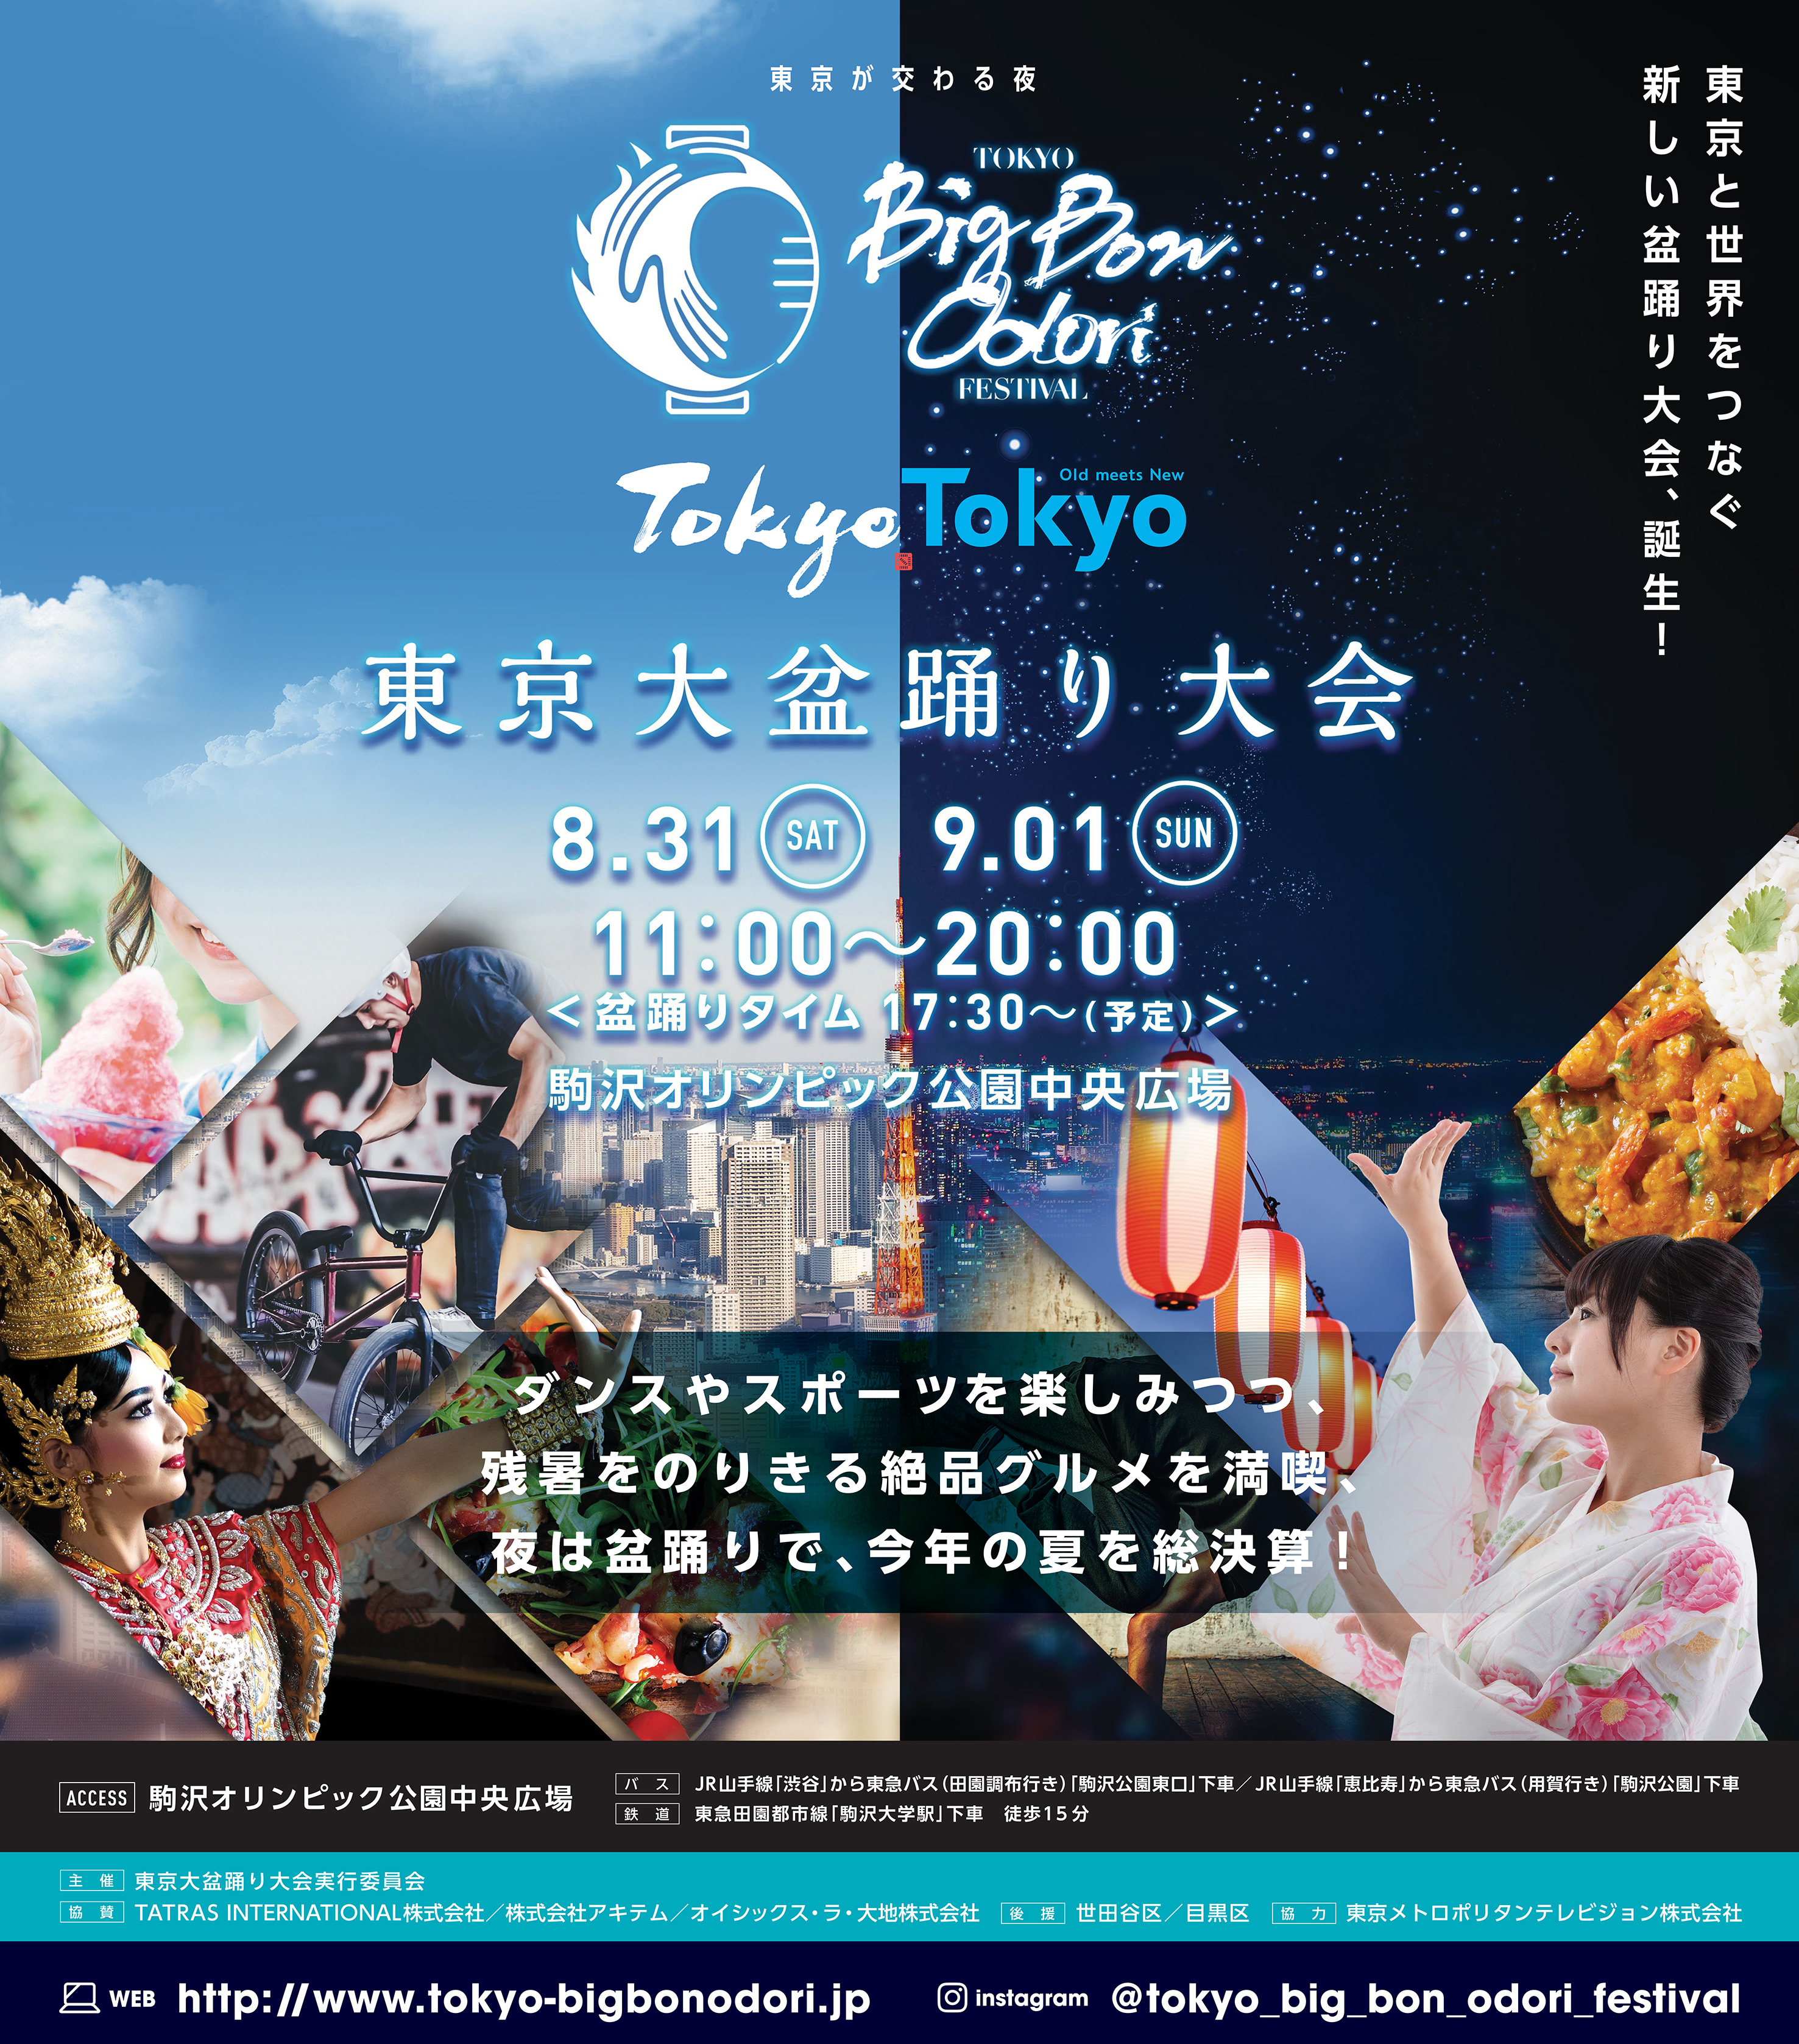 『Tokyo Big Bon Odori Festival 2019』8/31(土)・9/1(日)駒沢オリンピック公園 【 EXILE USA氏プロデュースの盆踊りタイムを連日開催】